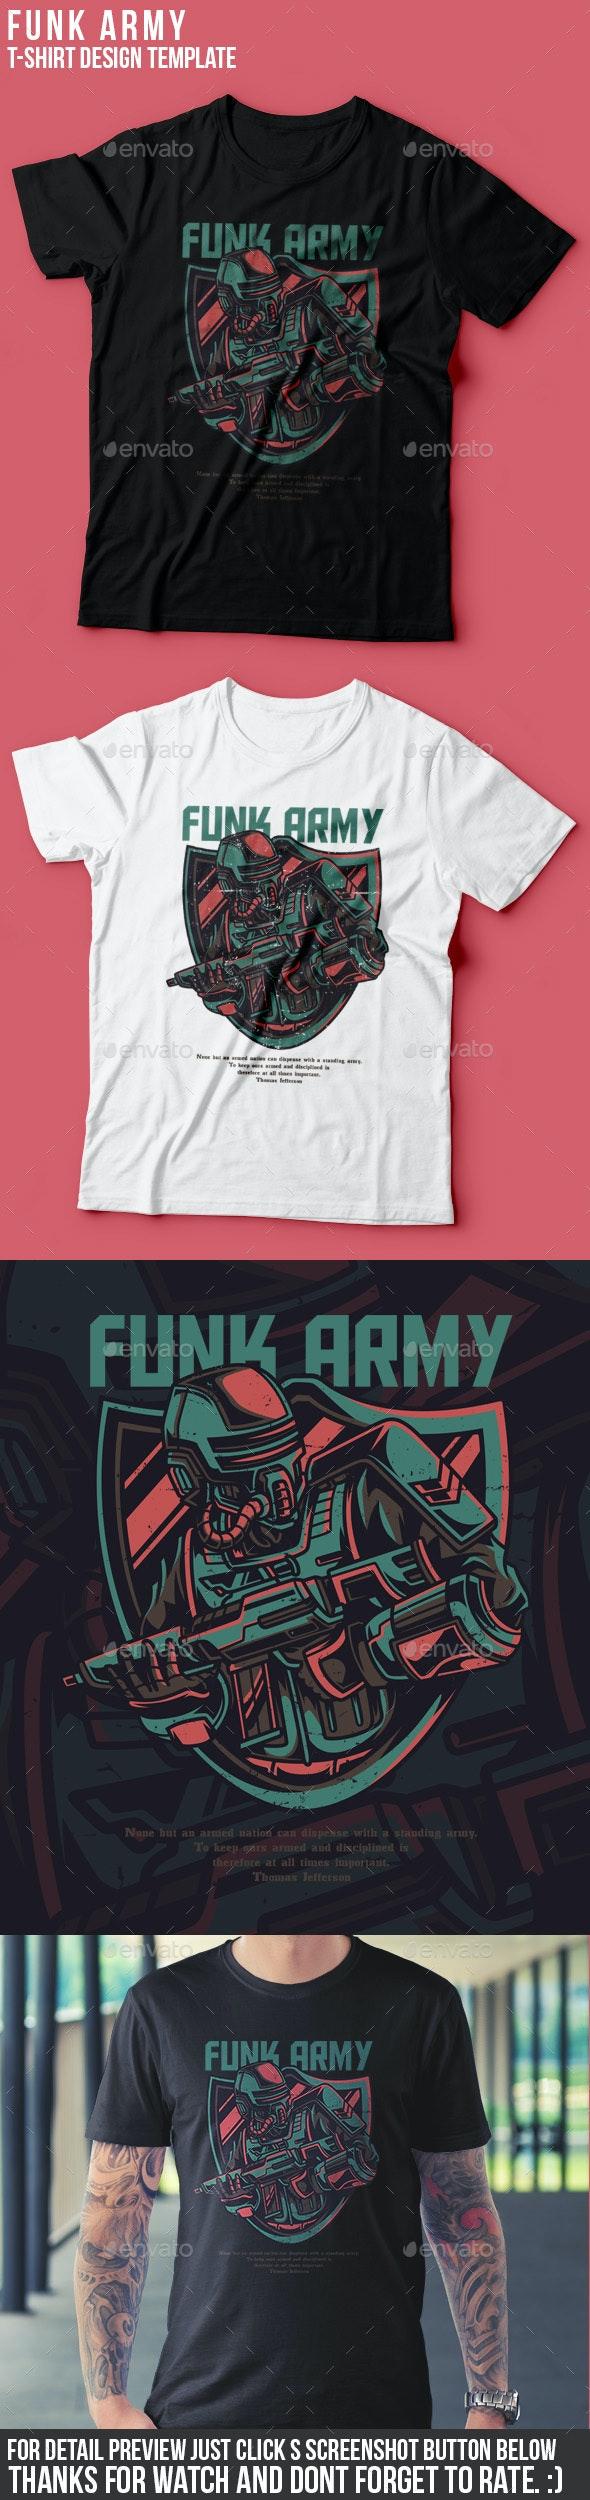 Funk Army T-Shirt Design - Grunge Designs